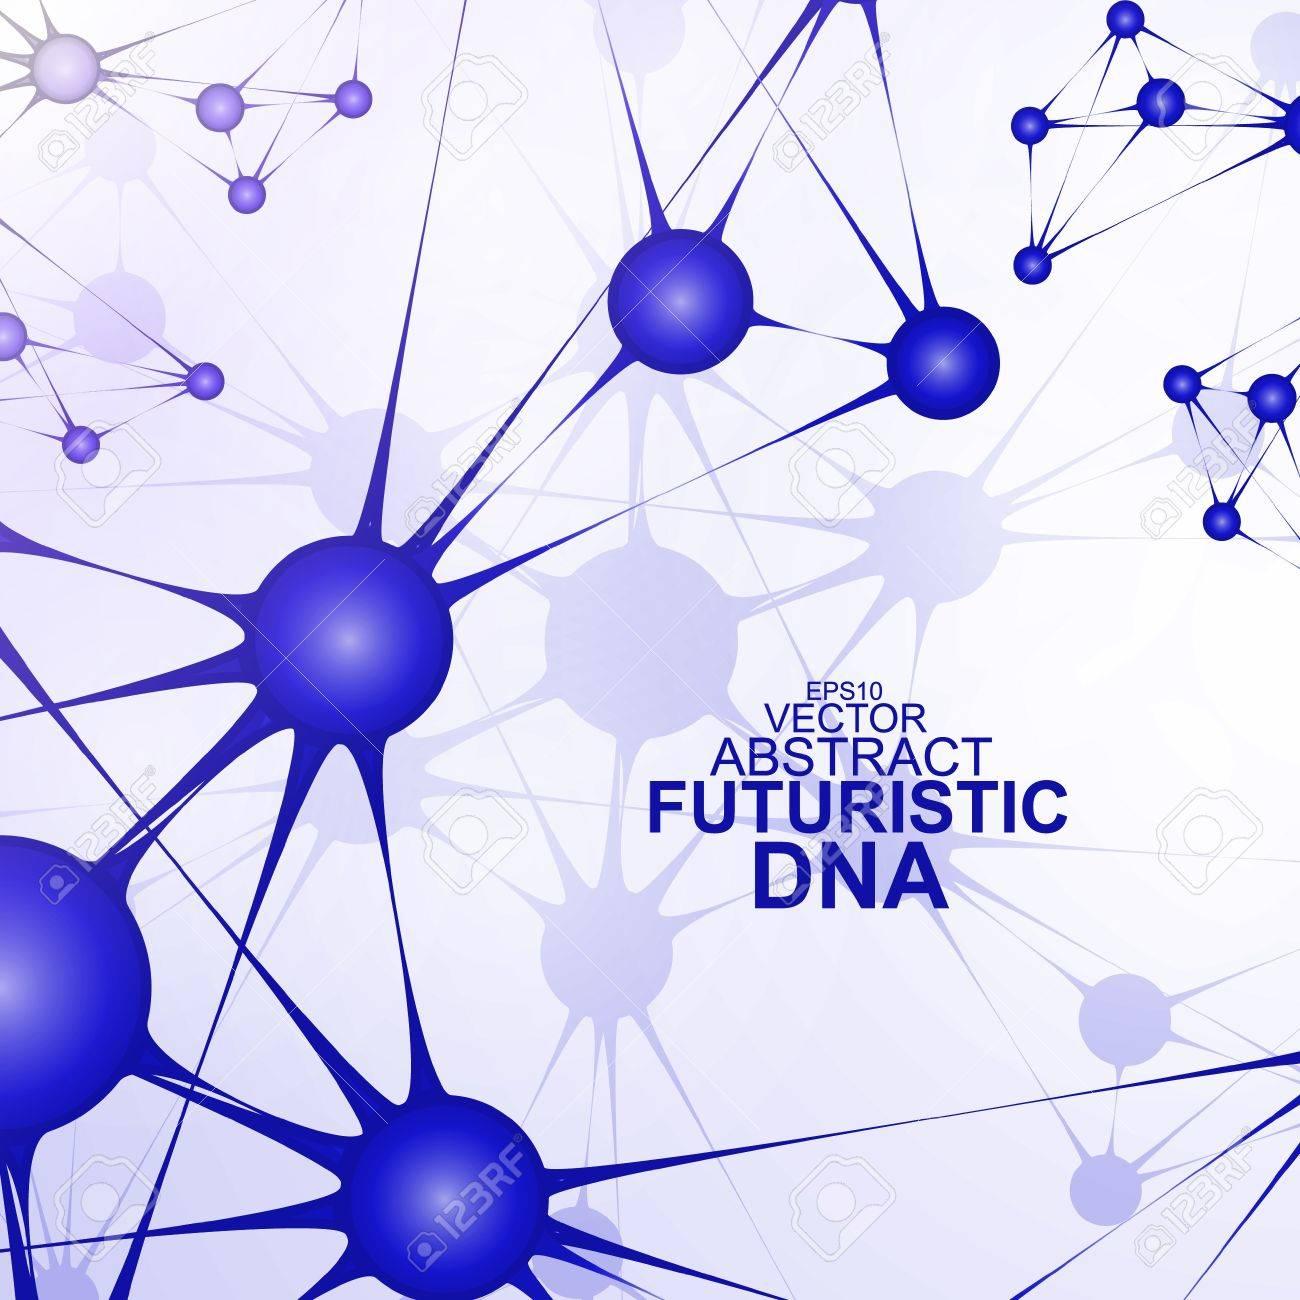 Futuristic dna, abstract molecule, cell illustration Stock Vector - 21160179